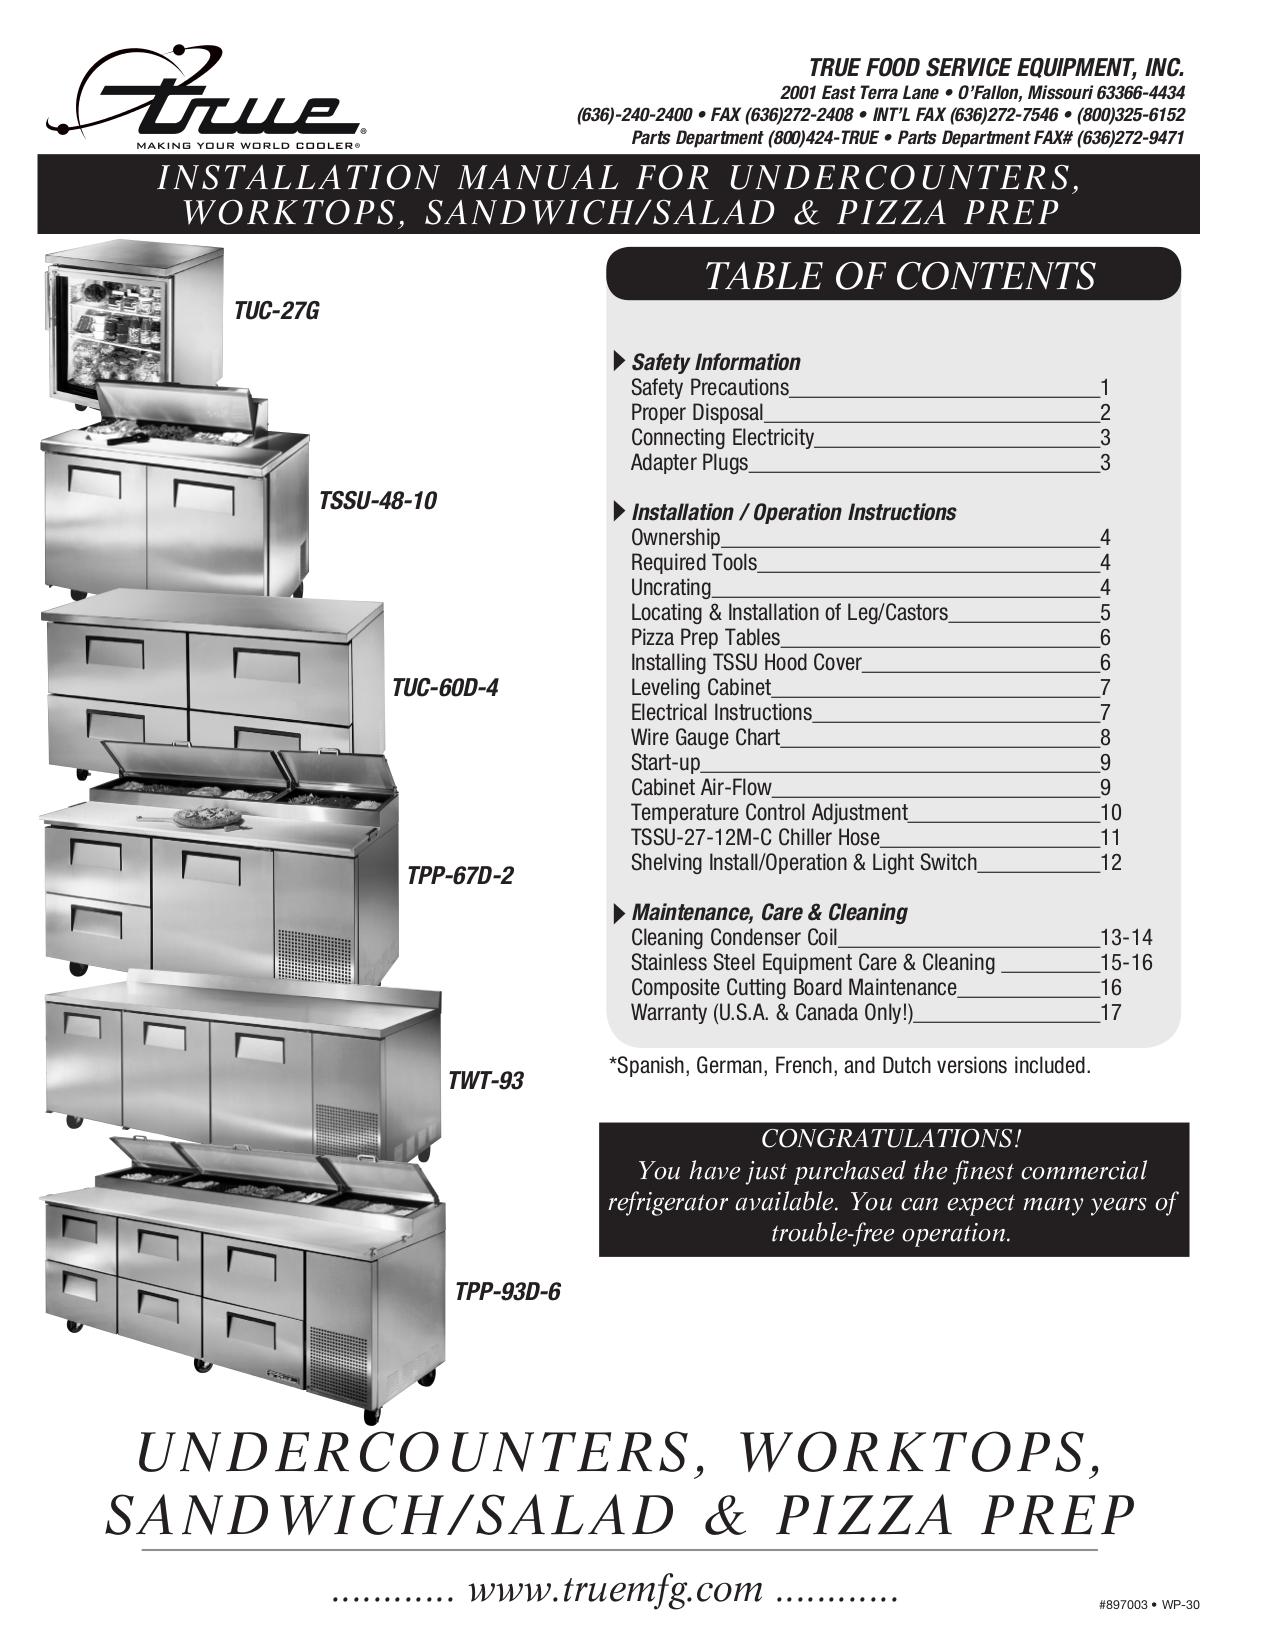 TSSU_Manual.pdf 0 download free pdf for true tuc 27 refrigerator manual true tuc-48 wiring diagram at cos-gaming.co